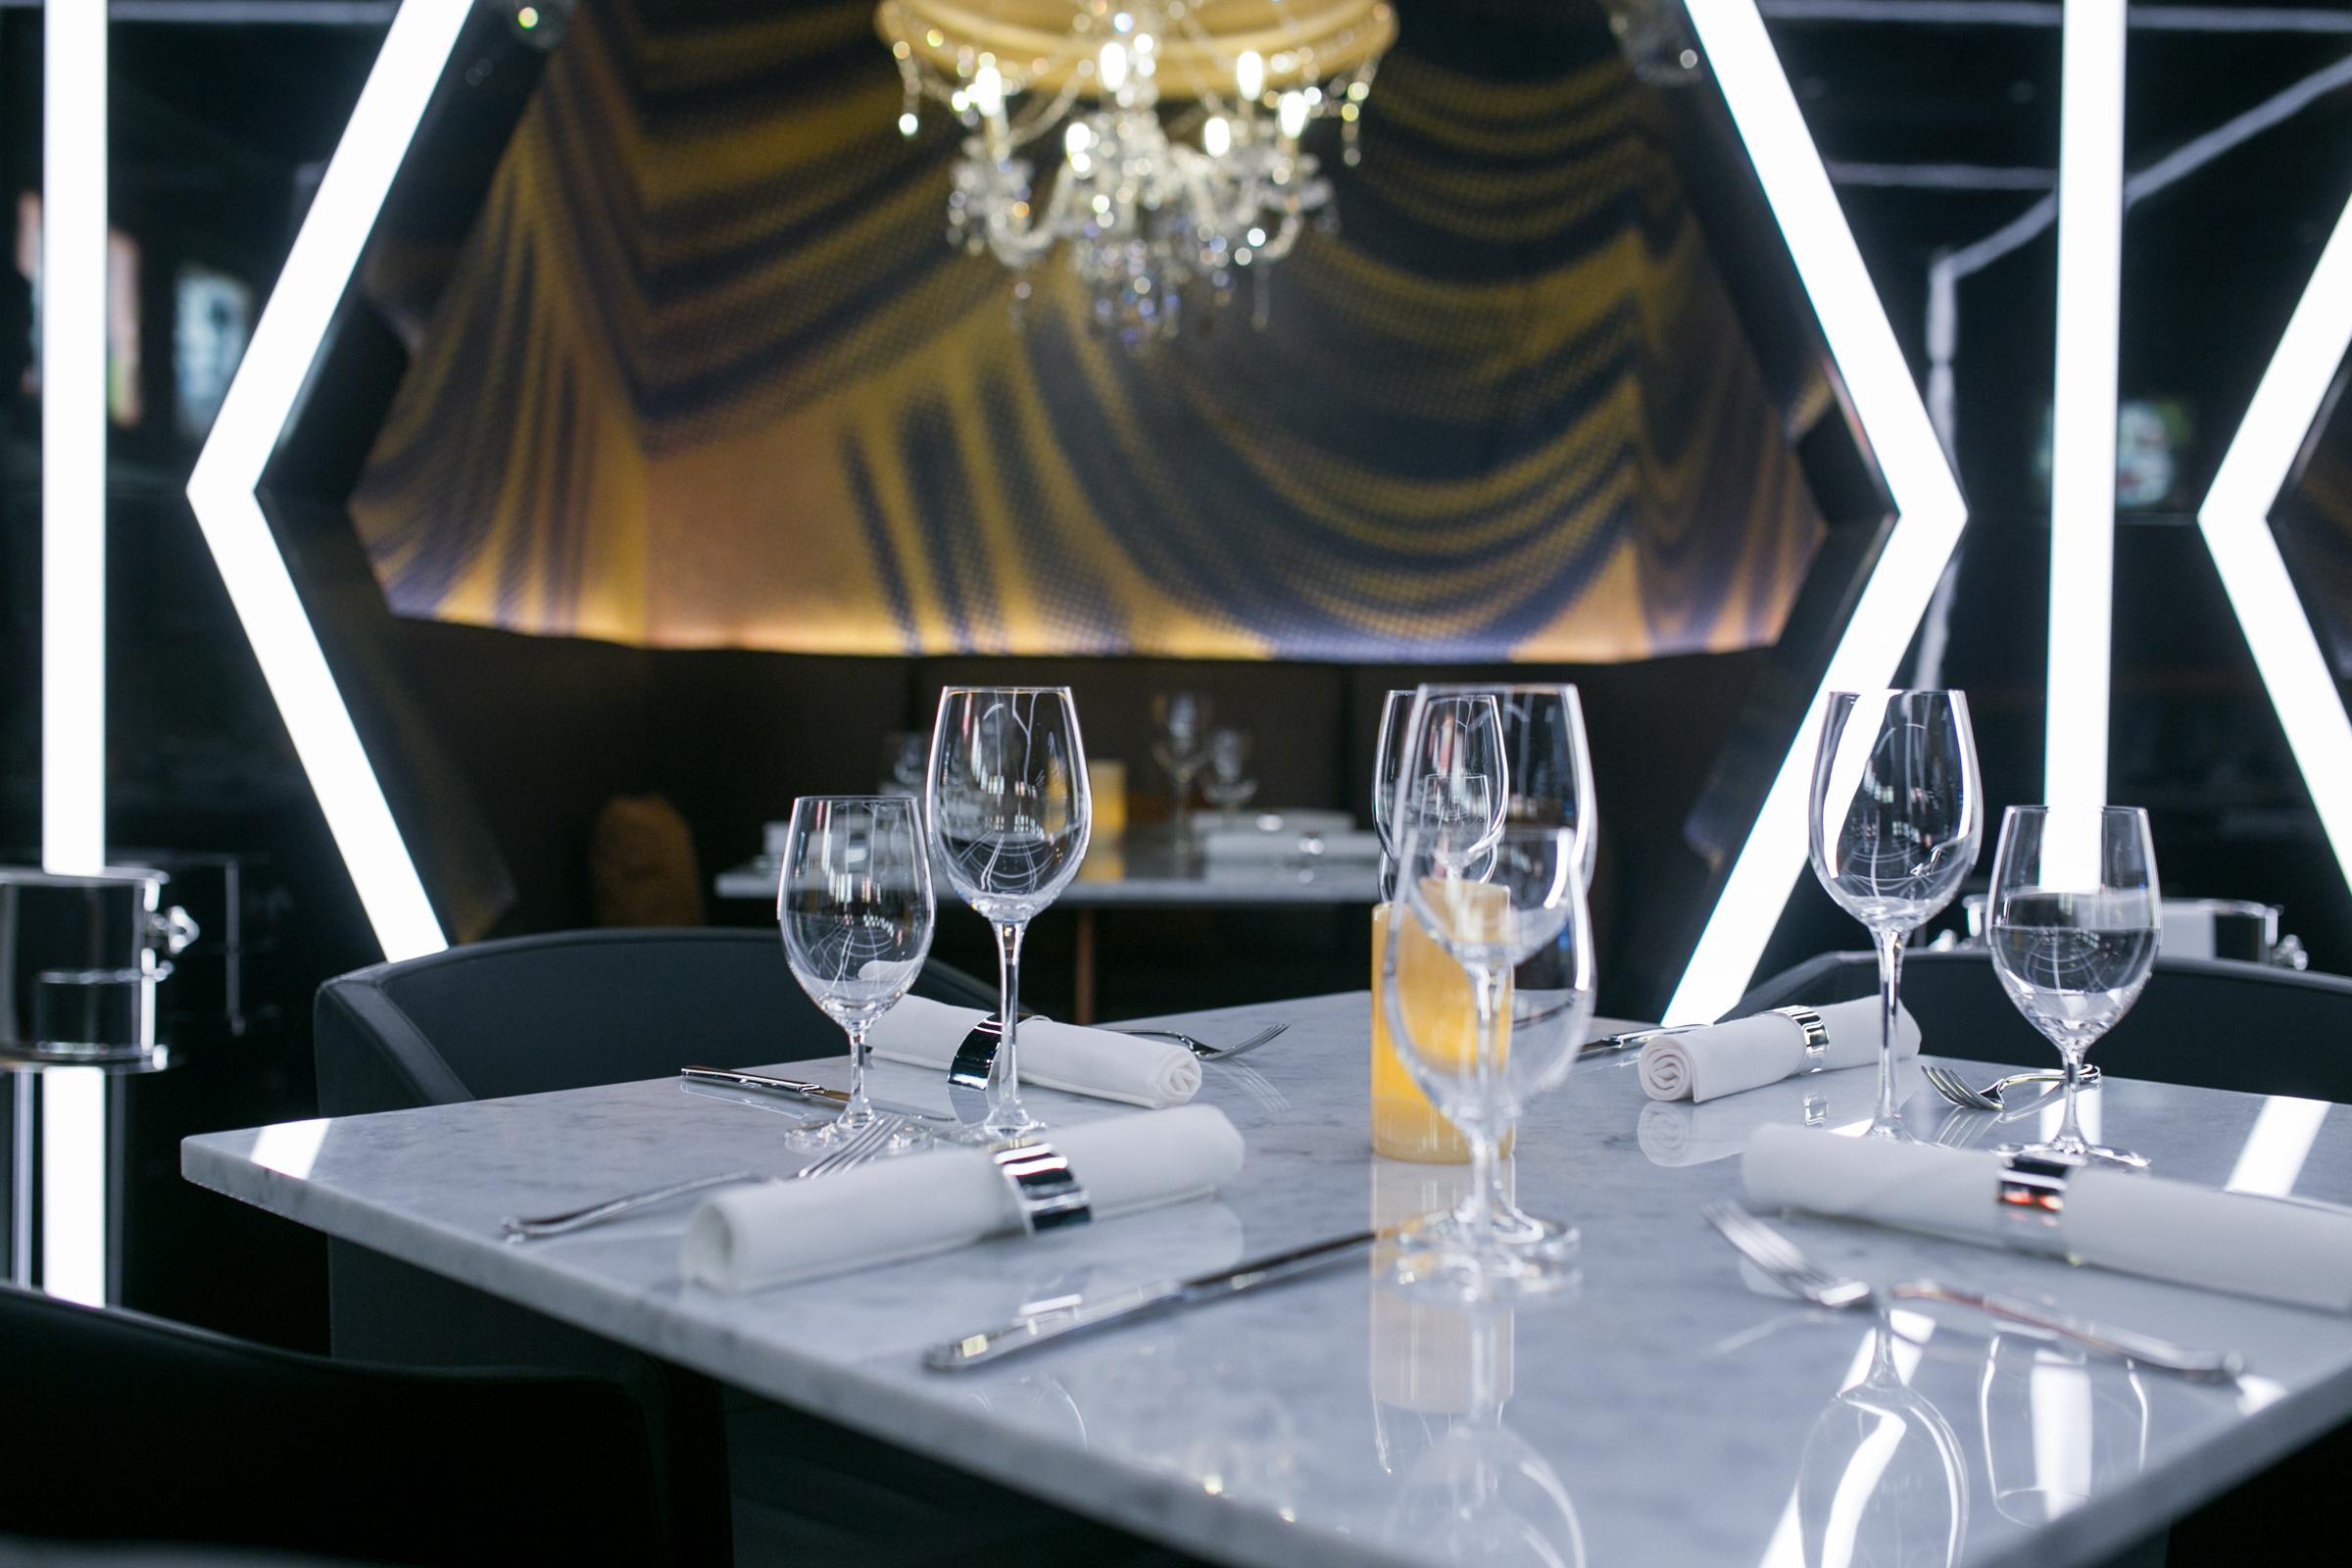 Caramel-restaurant-and-lounge-london-abu-dabi-dubai-oman-new-restaurant-in-london-minas-planet-review-jasmina-haskovic4.jpg